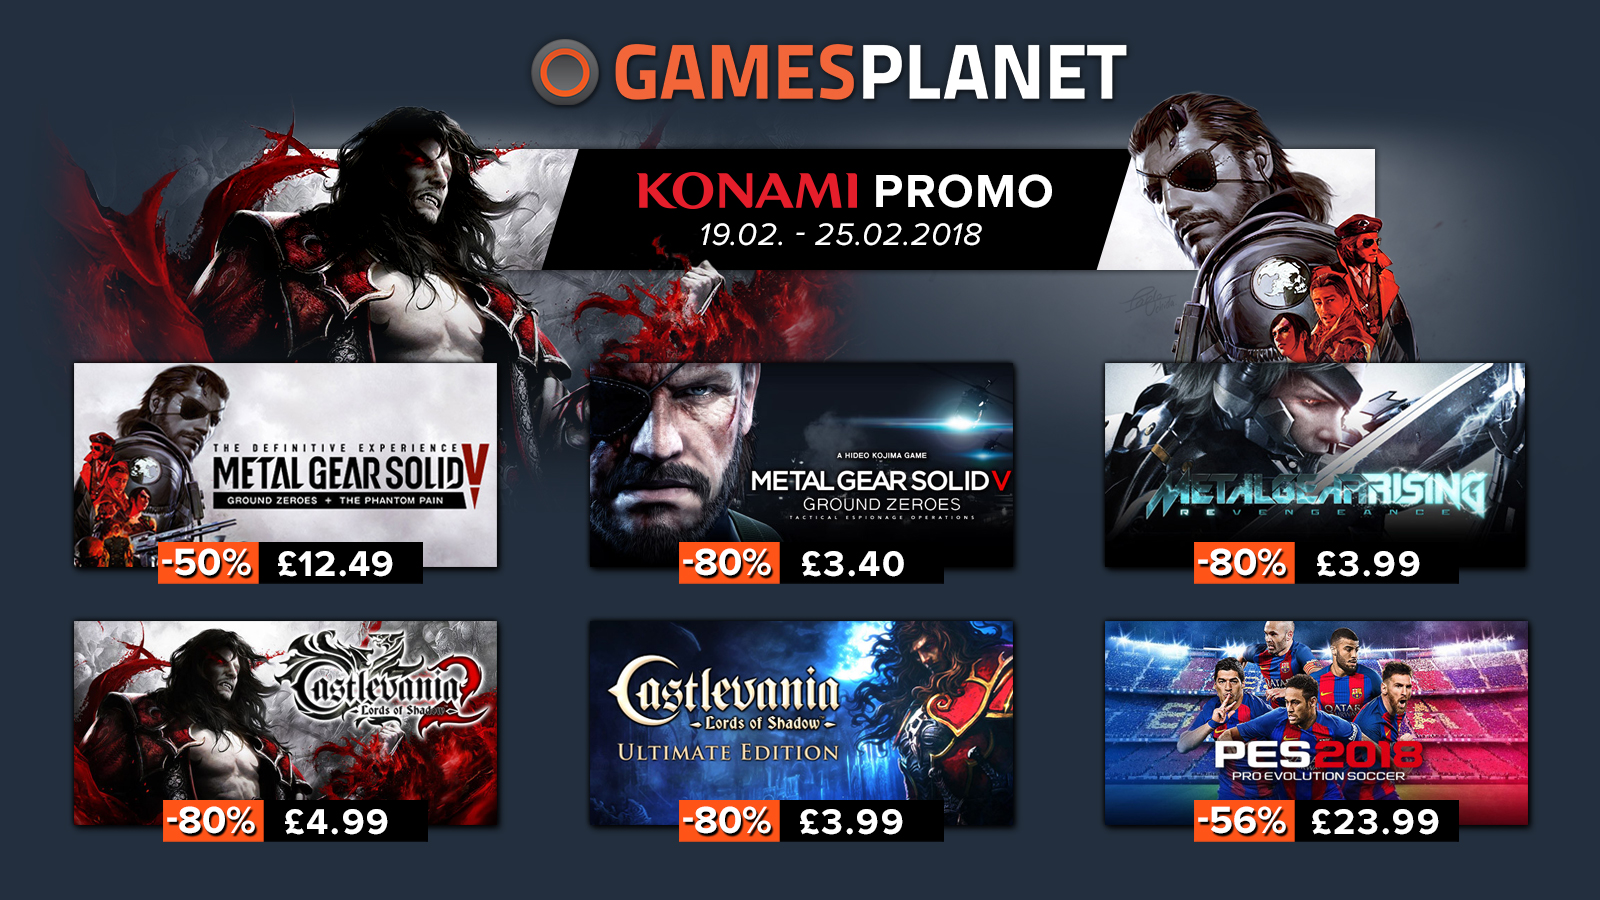 Konami games on sale, Steam redeemable, Steam alternatives